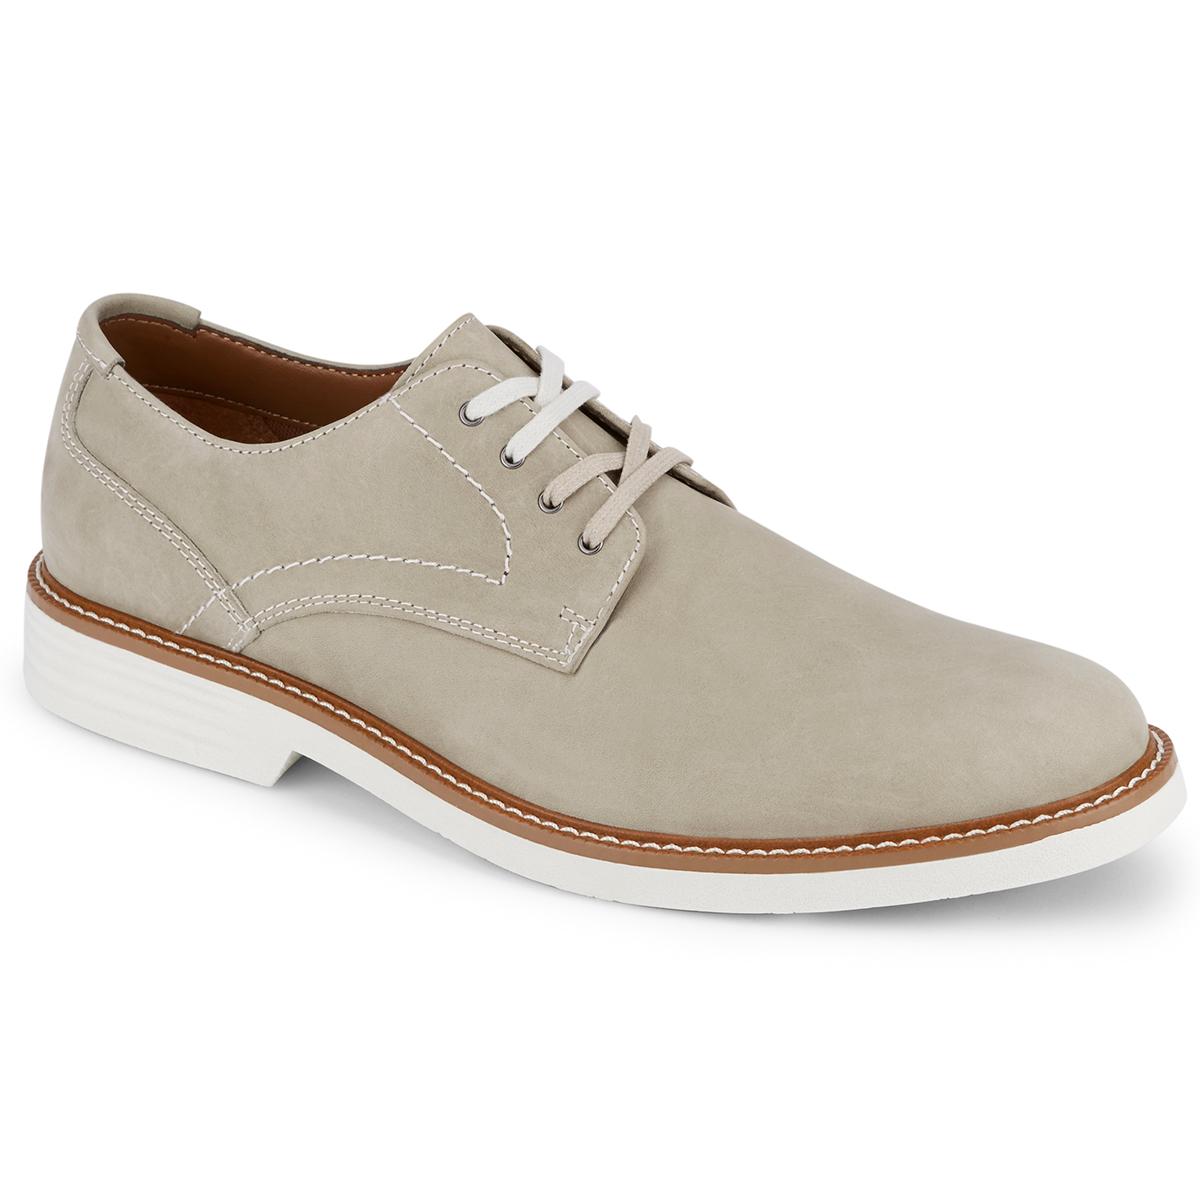 Dockers Men's Parkway Oxford Shoe - Black, 8